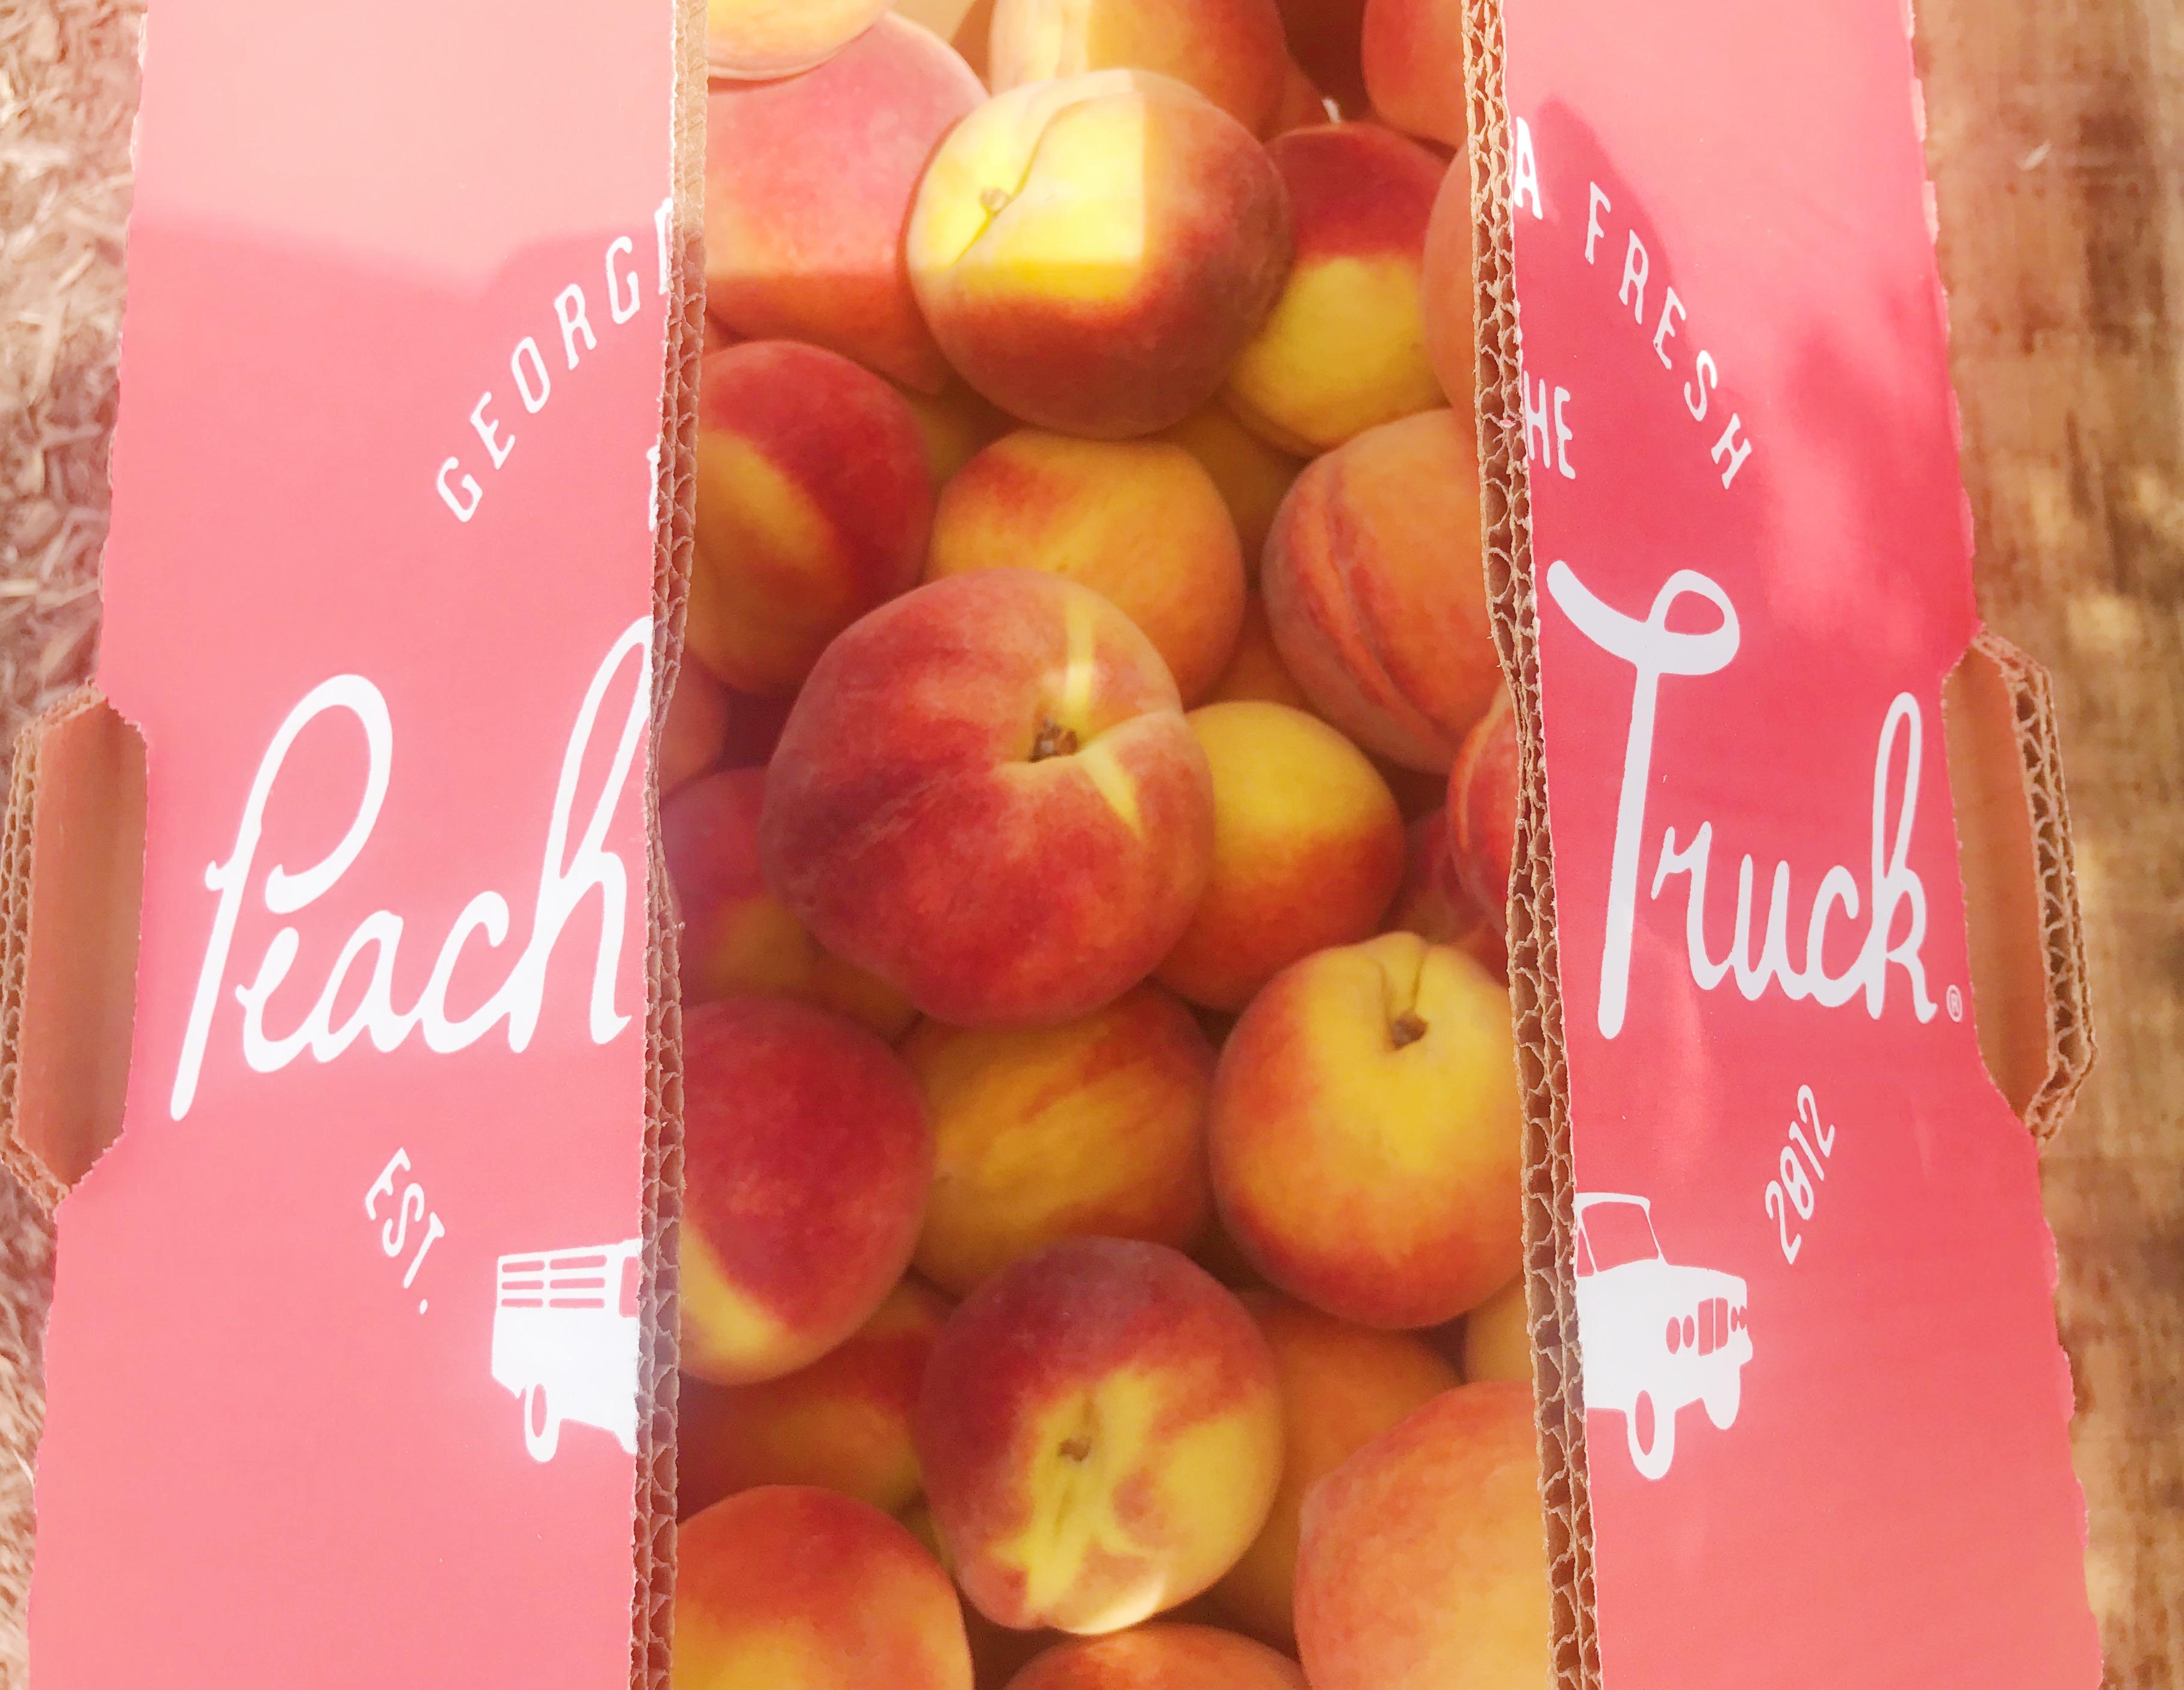 Zach Milner Preaches Peaches